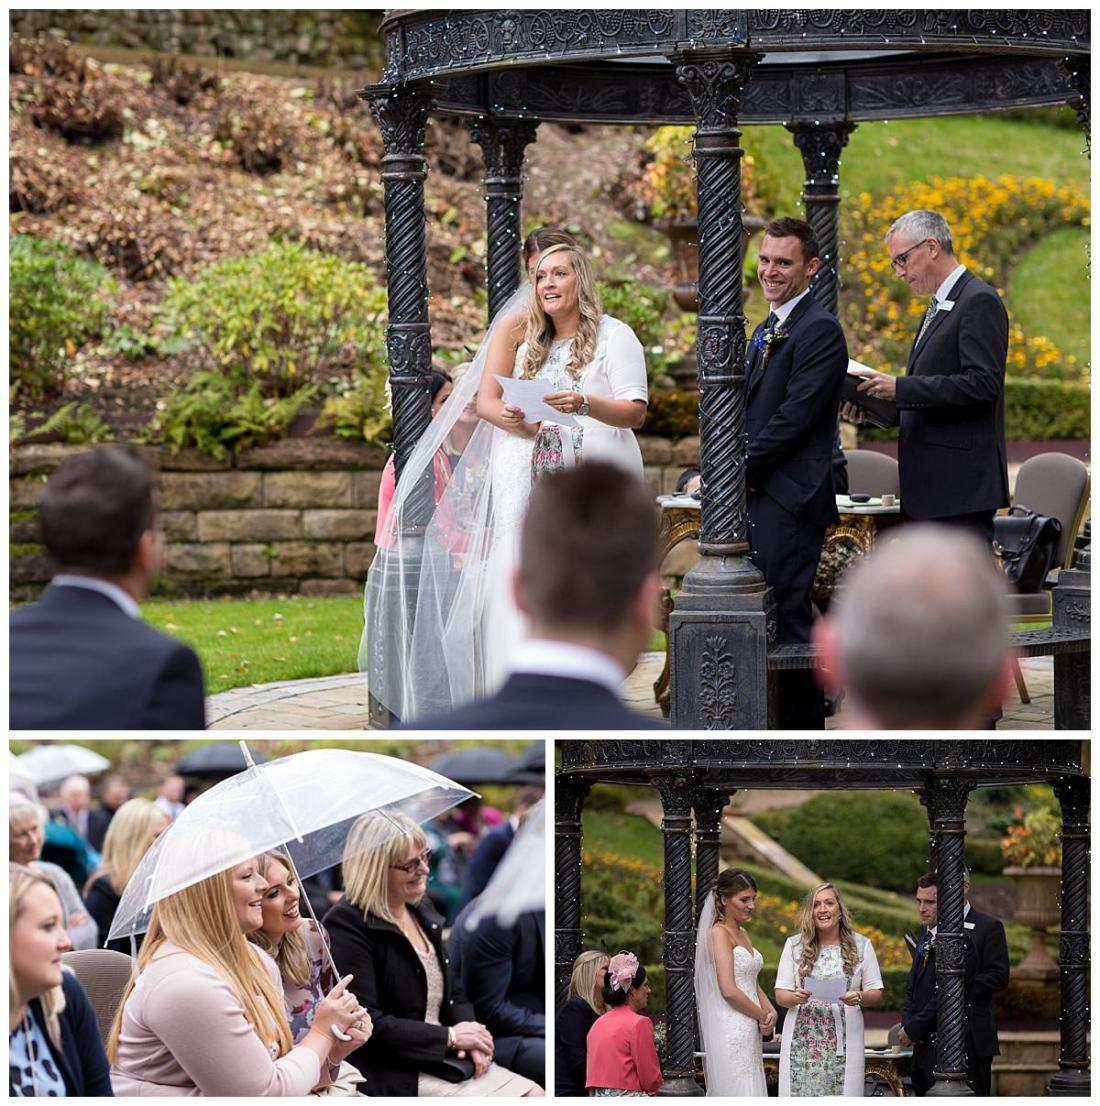 Wedding ceremony ready at The Raithwaite Estate